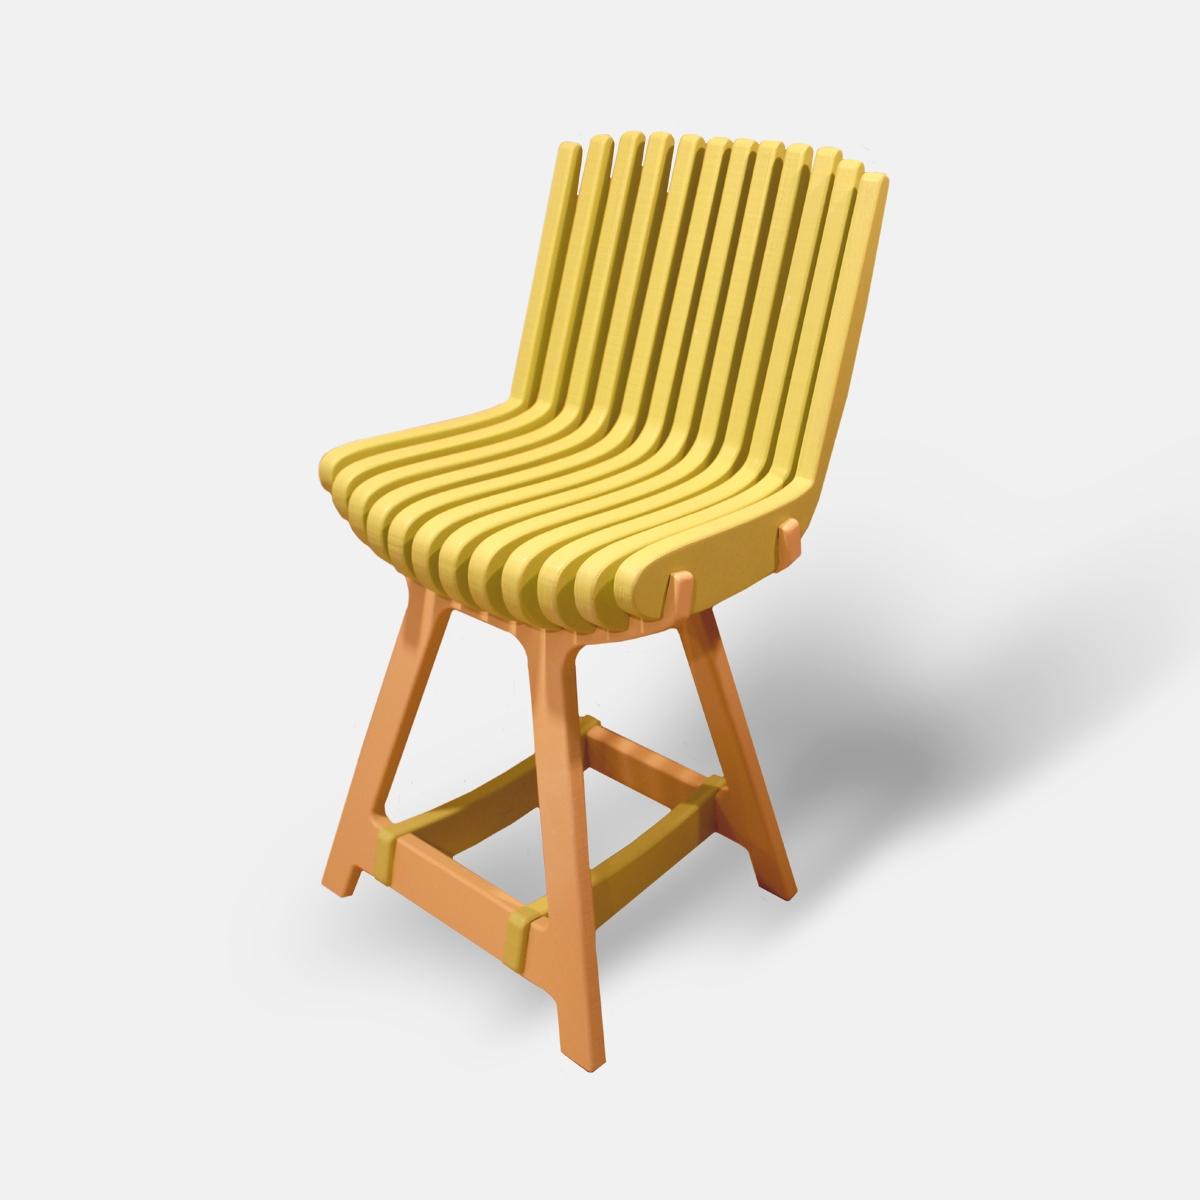 Кухонный стул италия